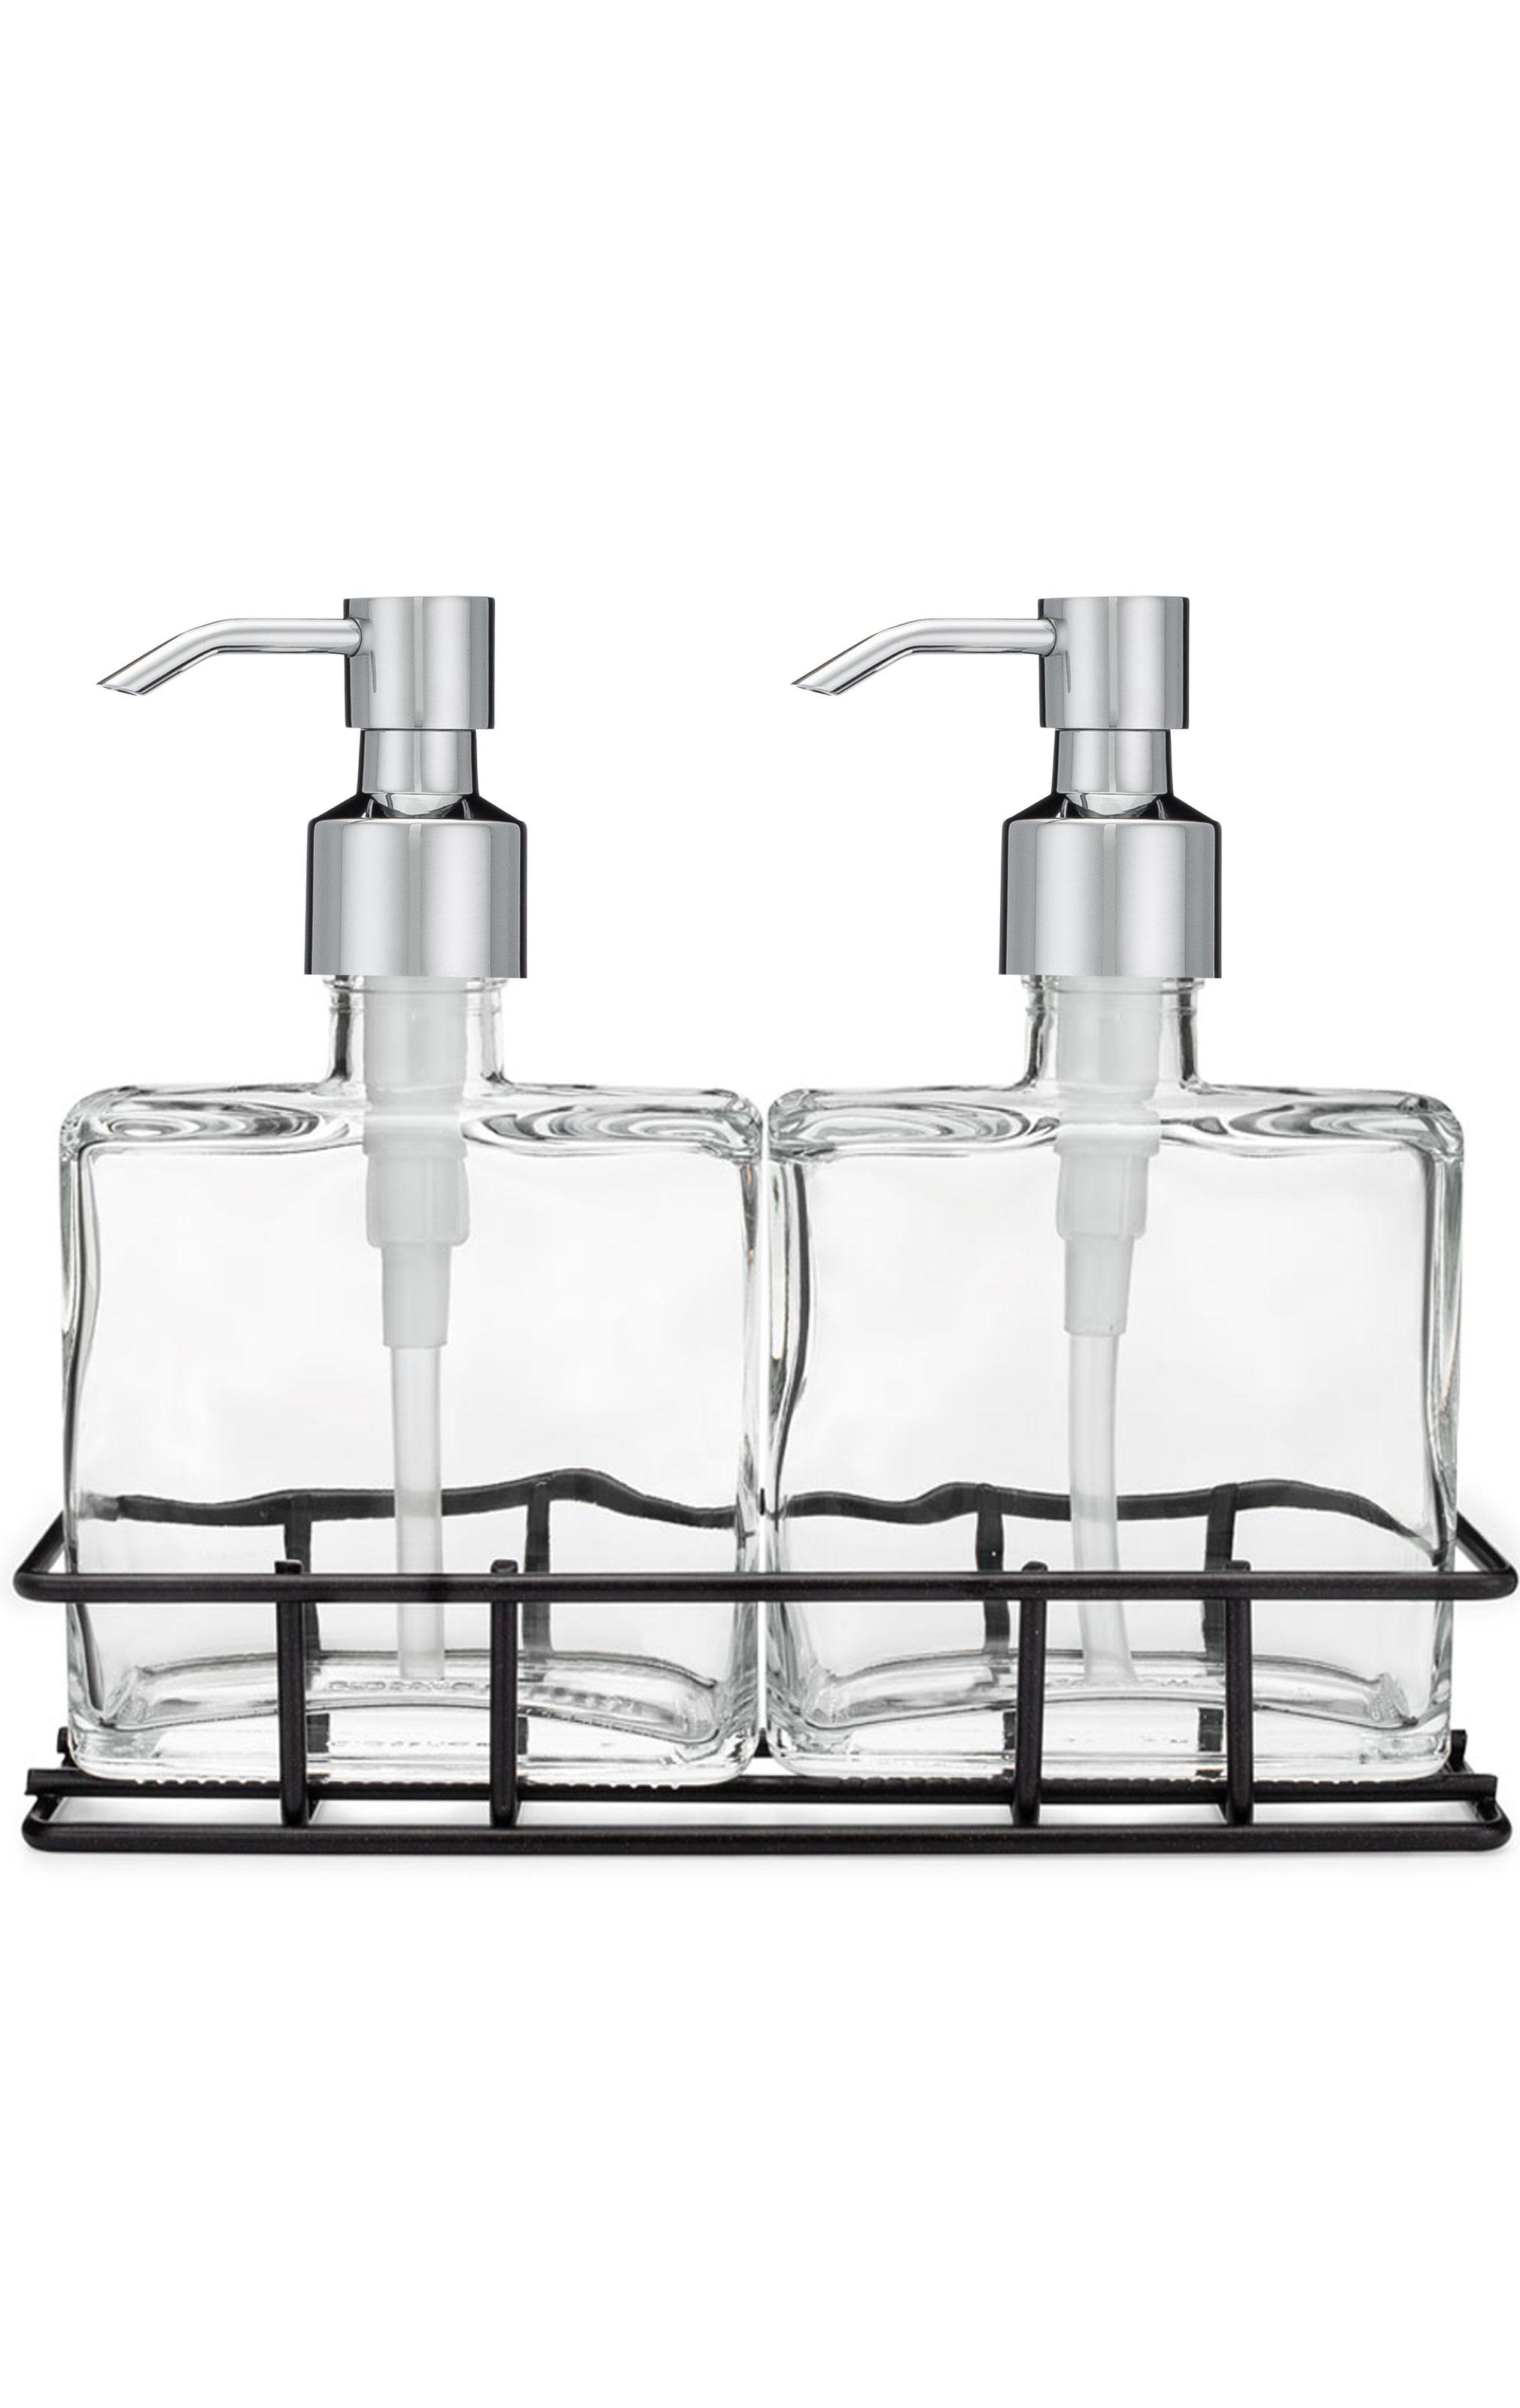 Urban Pair Glass Soap Lotion Dispenser Set W Metal Stand Foam Soap Dispenser Lotion Dispenser Kitchen Soap Dispenser